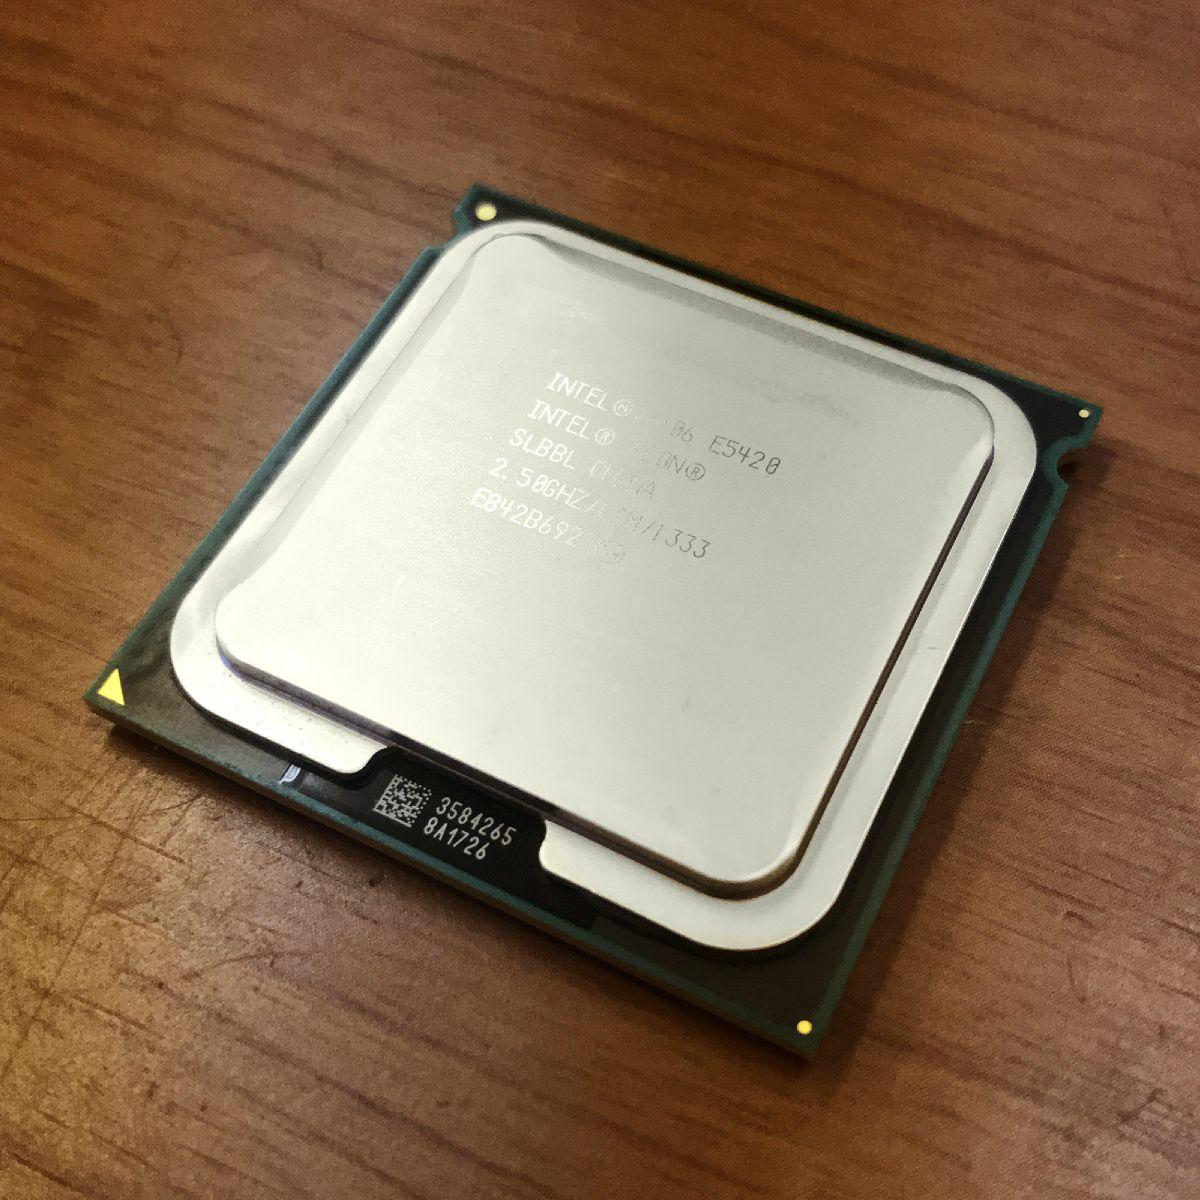 Intel Xeon E5420 Harpertown 2.5 GHz 12MB L2 Cache LGA 771 80W Processor -  USED